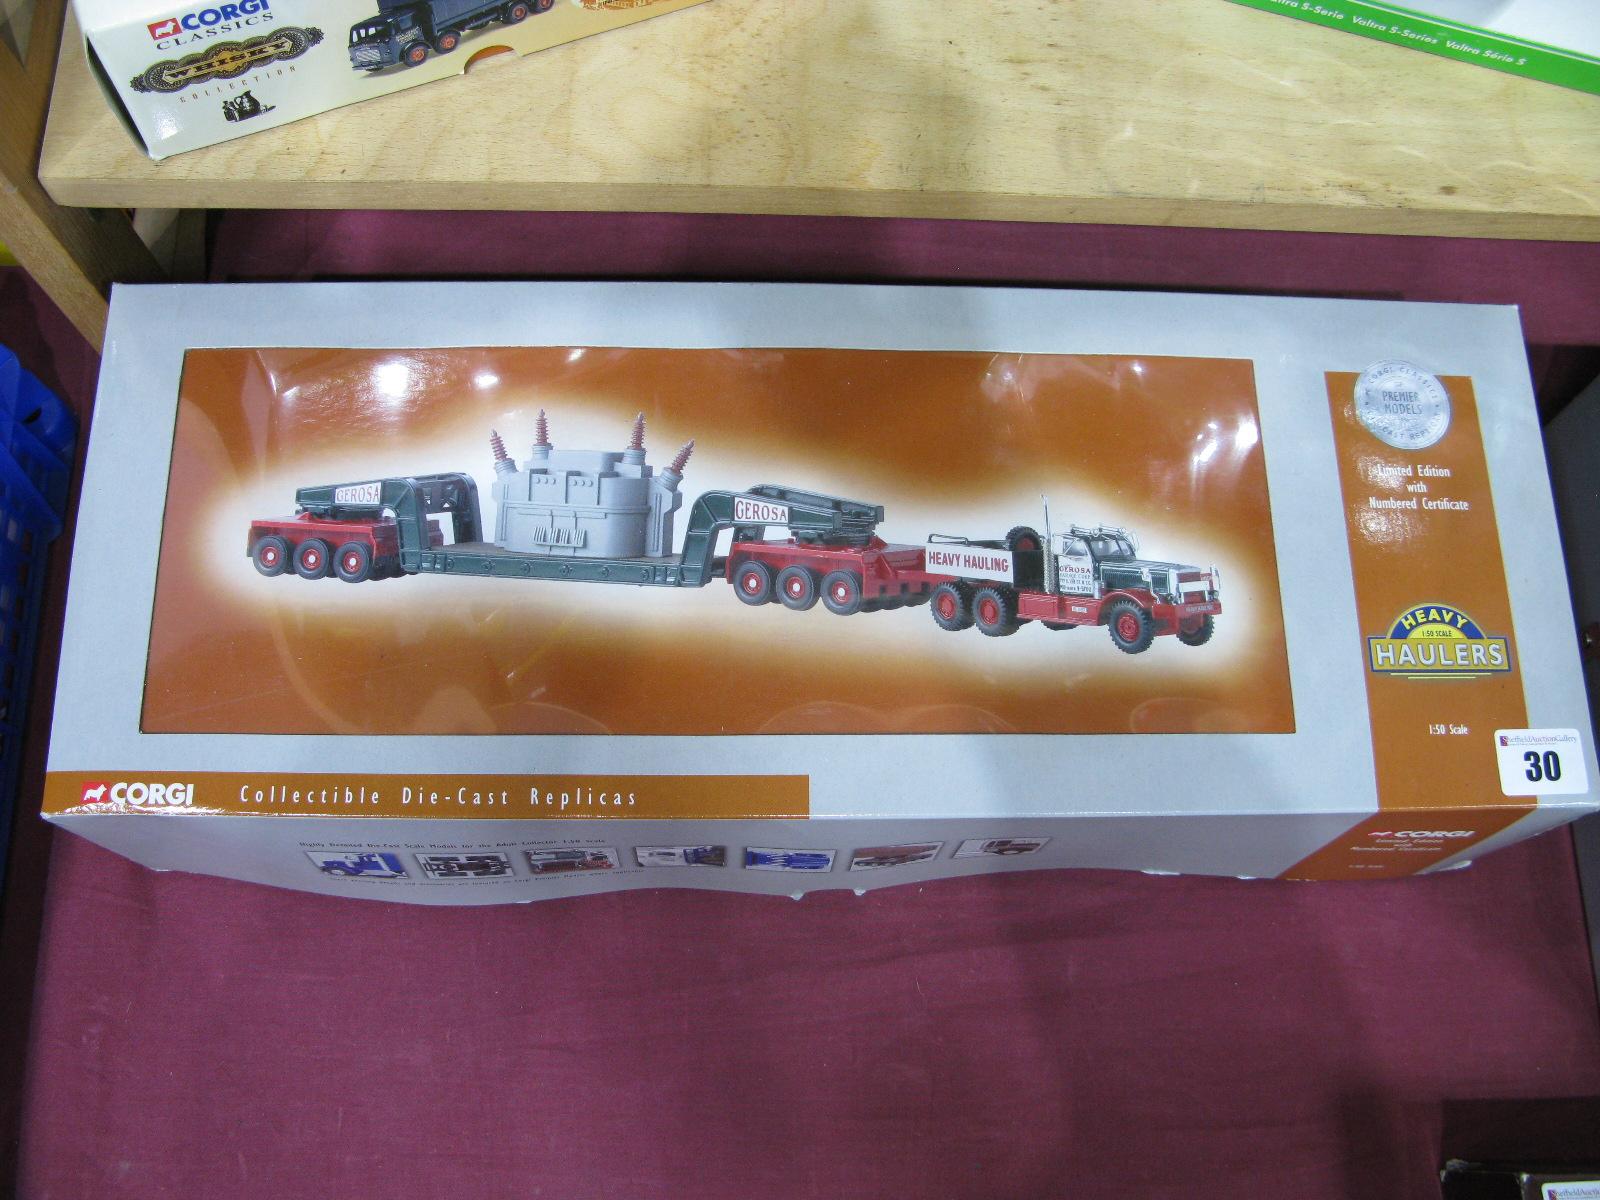 Lot 30 - Two U.S Outline 1/50th Scale Diecast model Trucks By Corgi, # US55103 Diamond T Girder trailer and